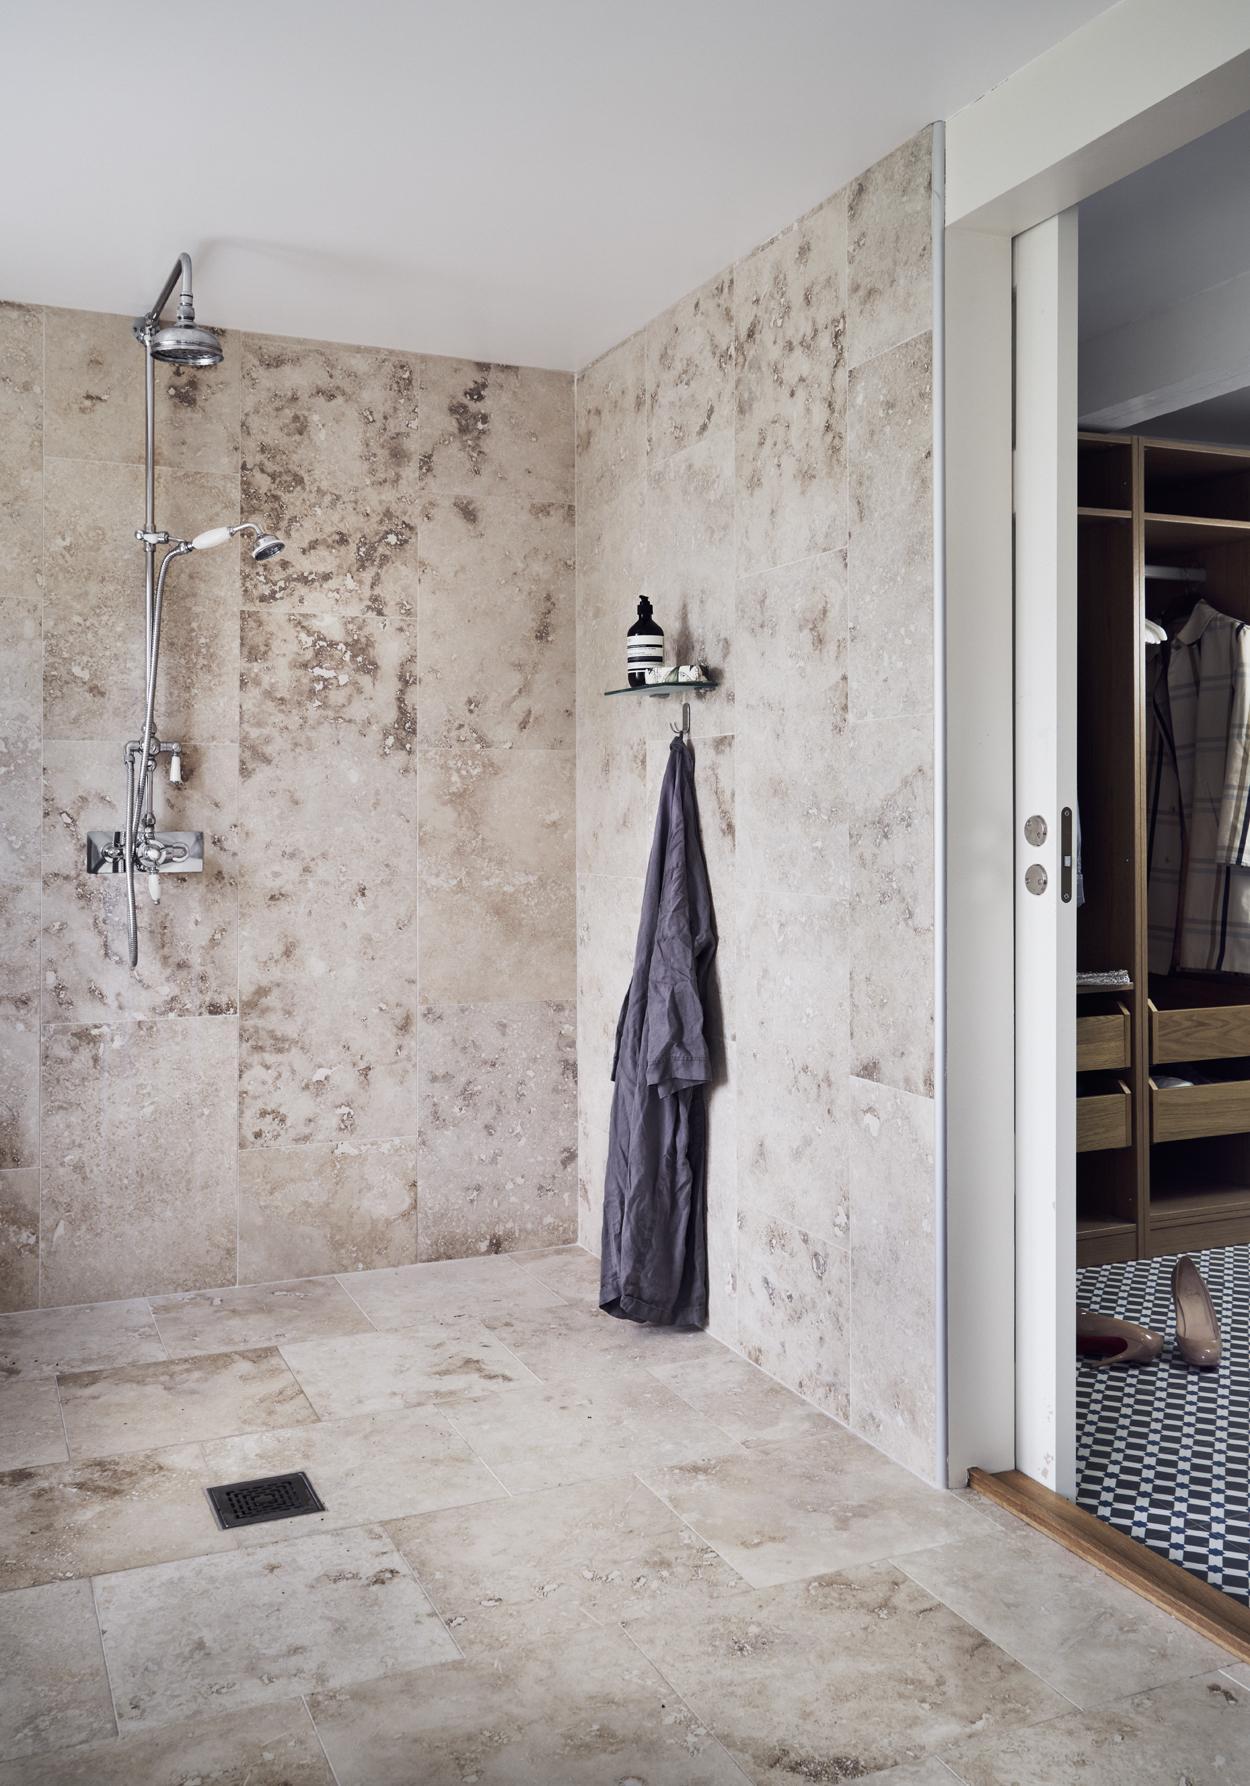 Fantastik frank interni villa svezia bagno pavimenti travertino